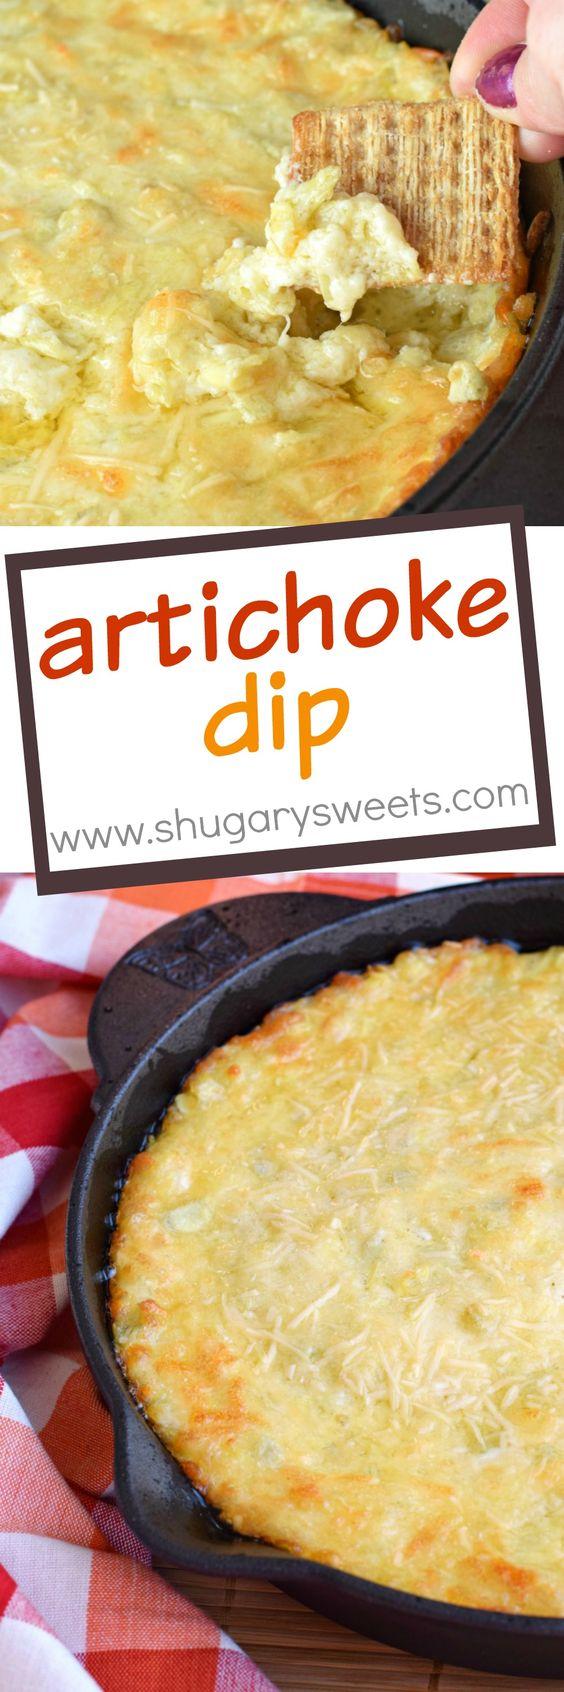 Artichoke Dip | Recipe | Artichoke Dip, Artichokes and Dips